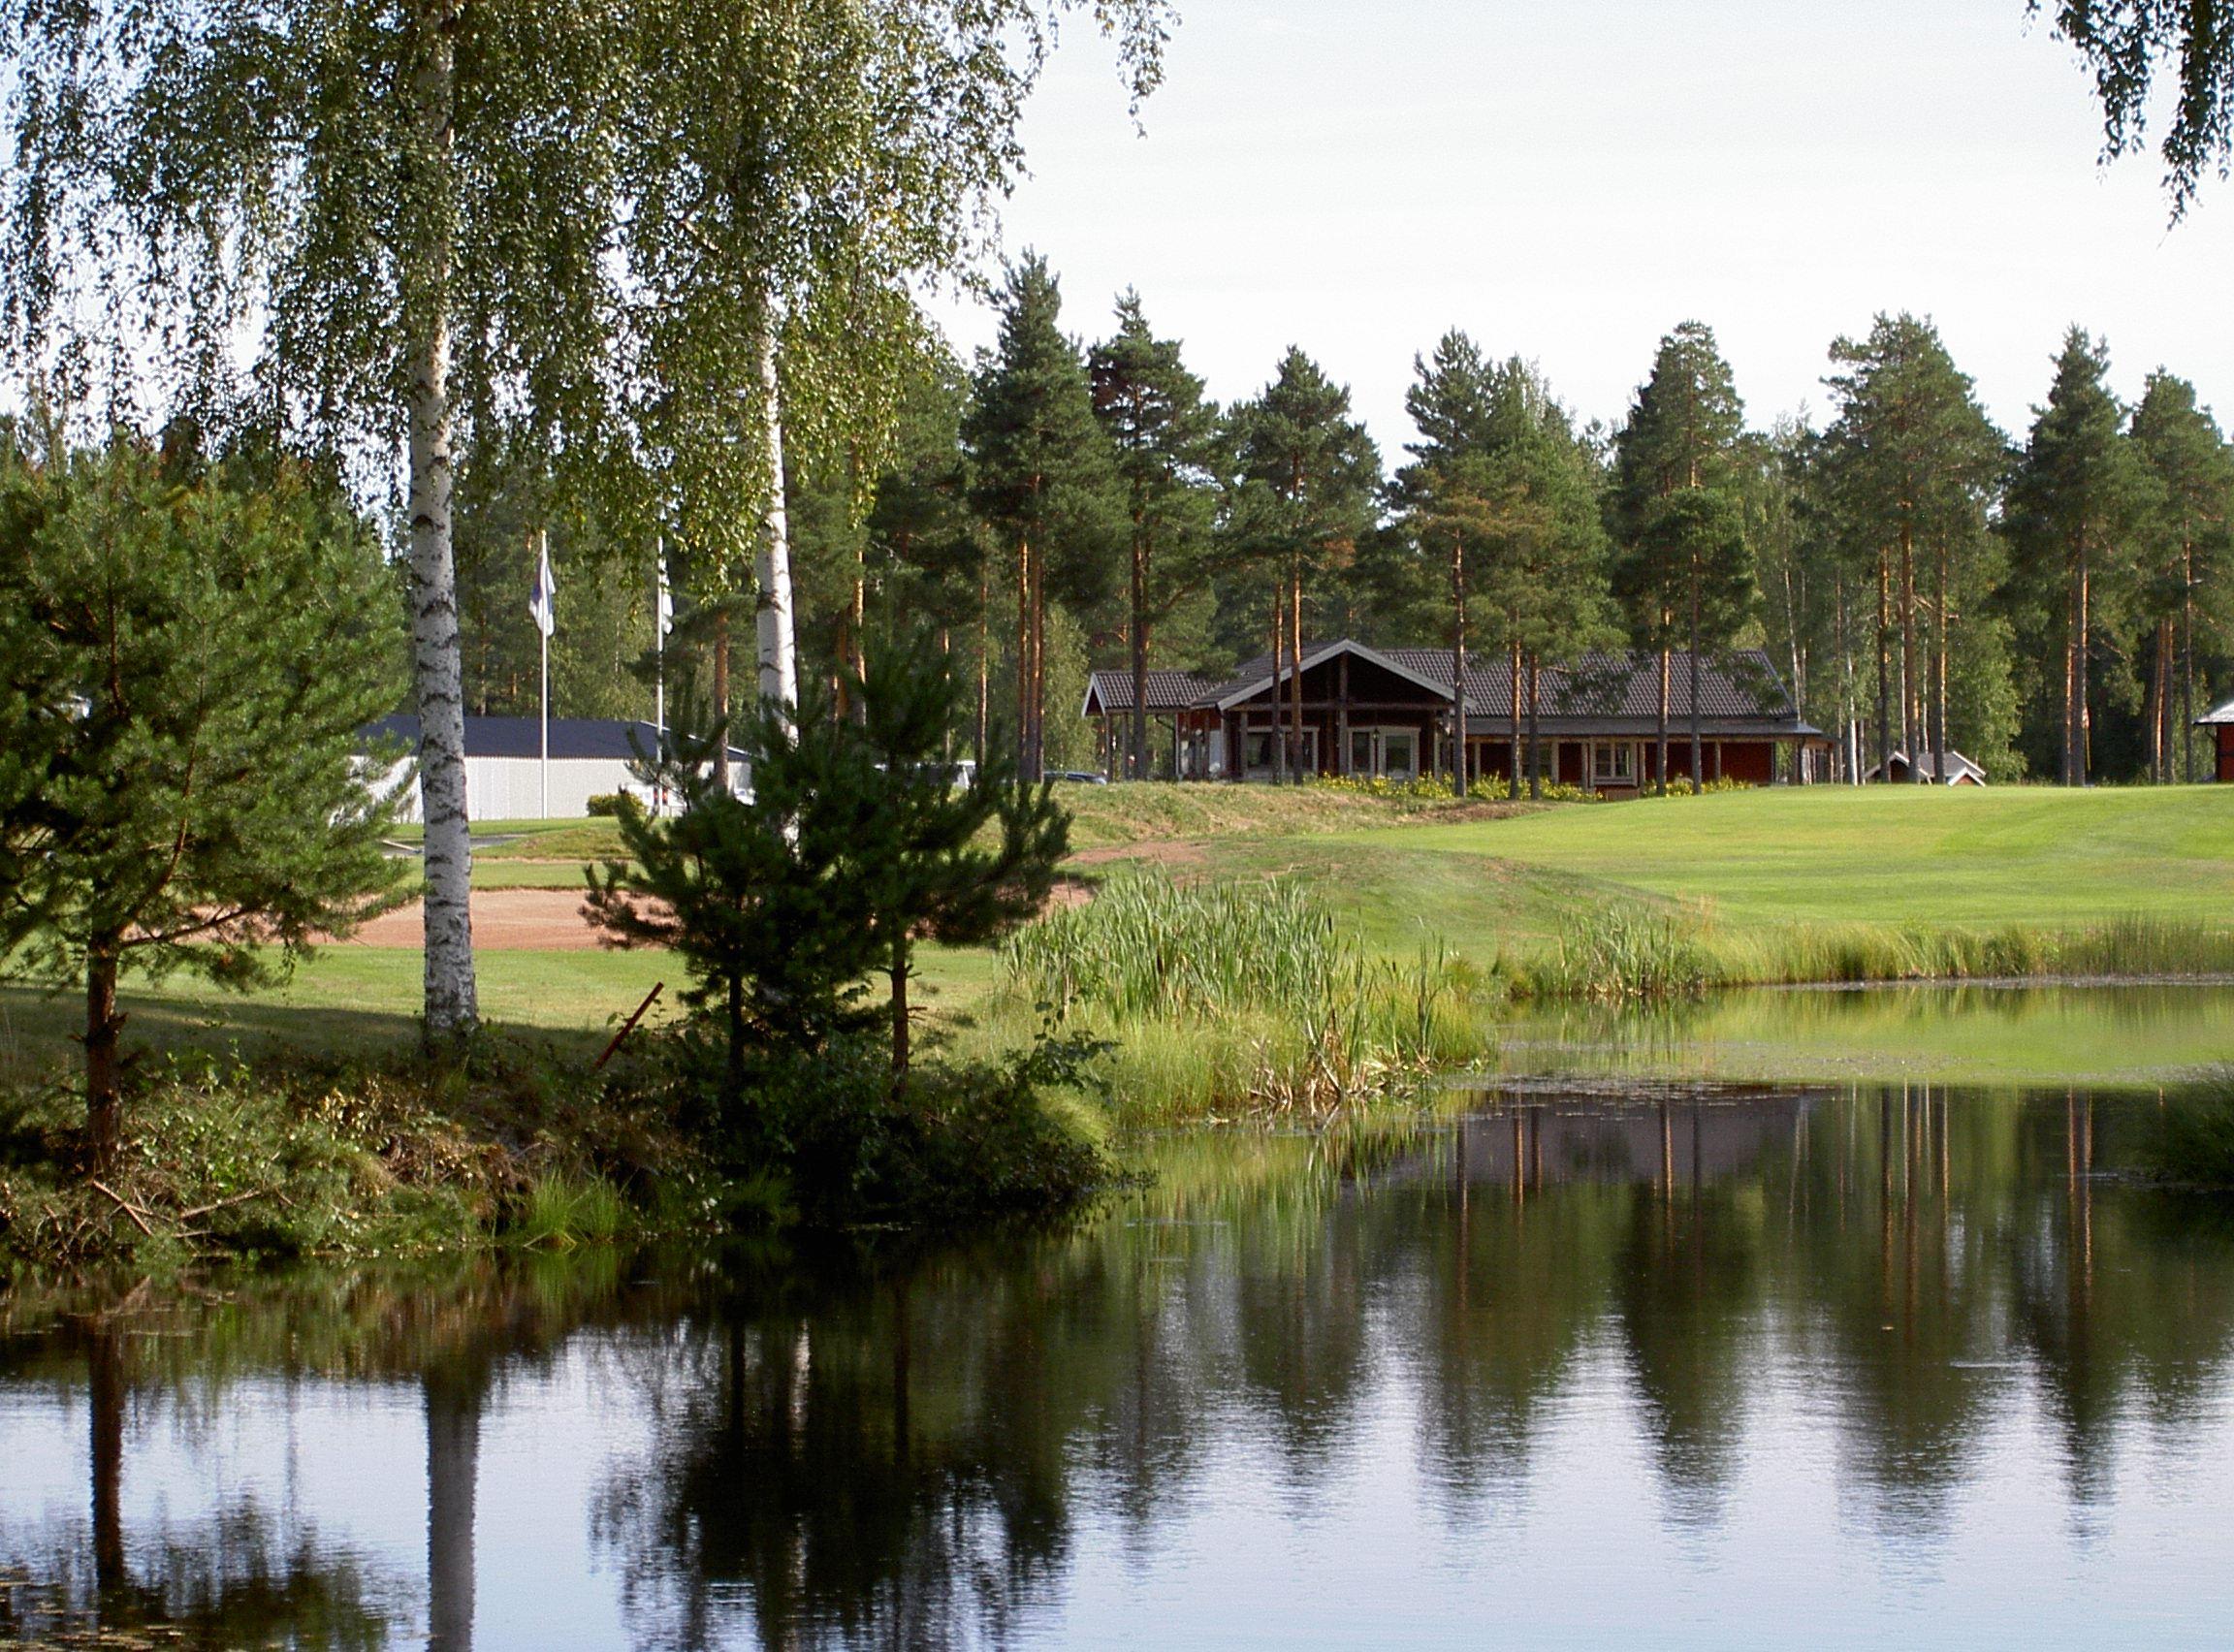 Solleö Golf course